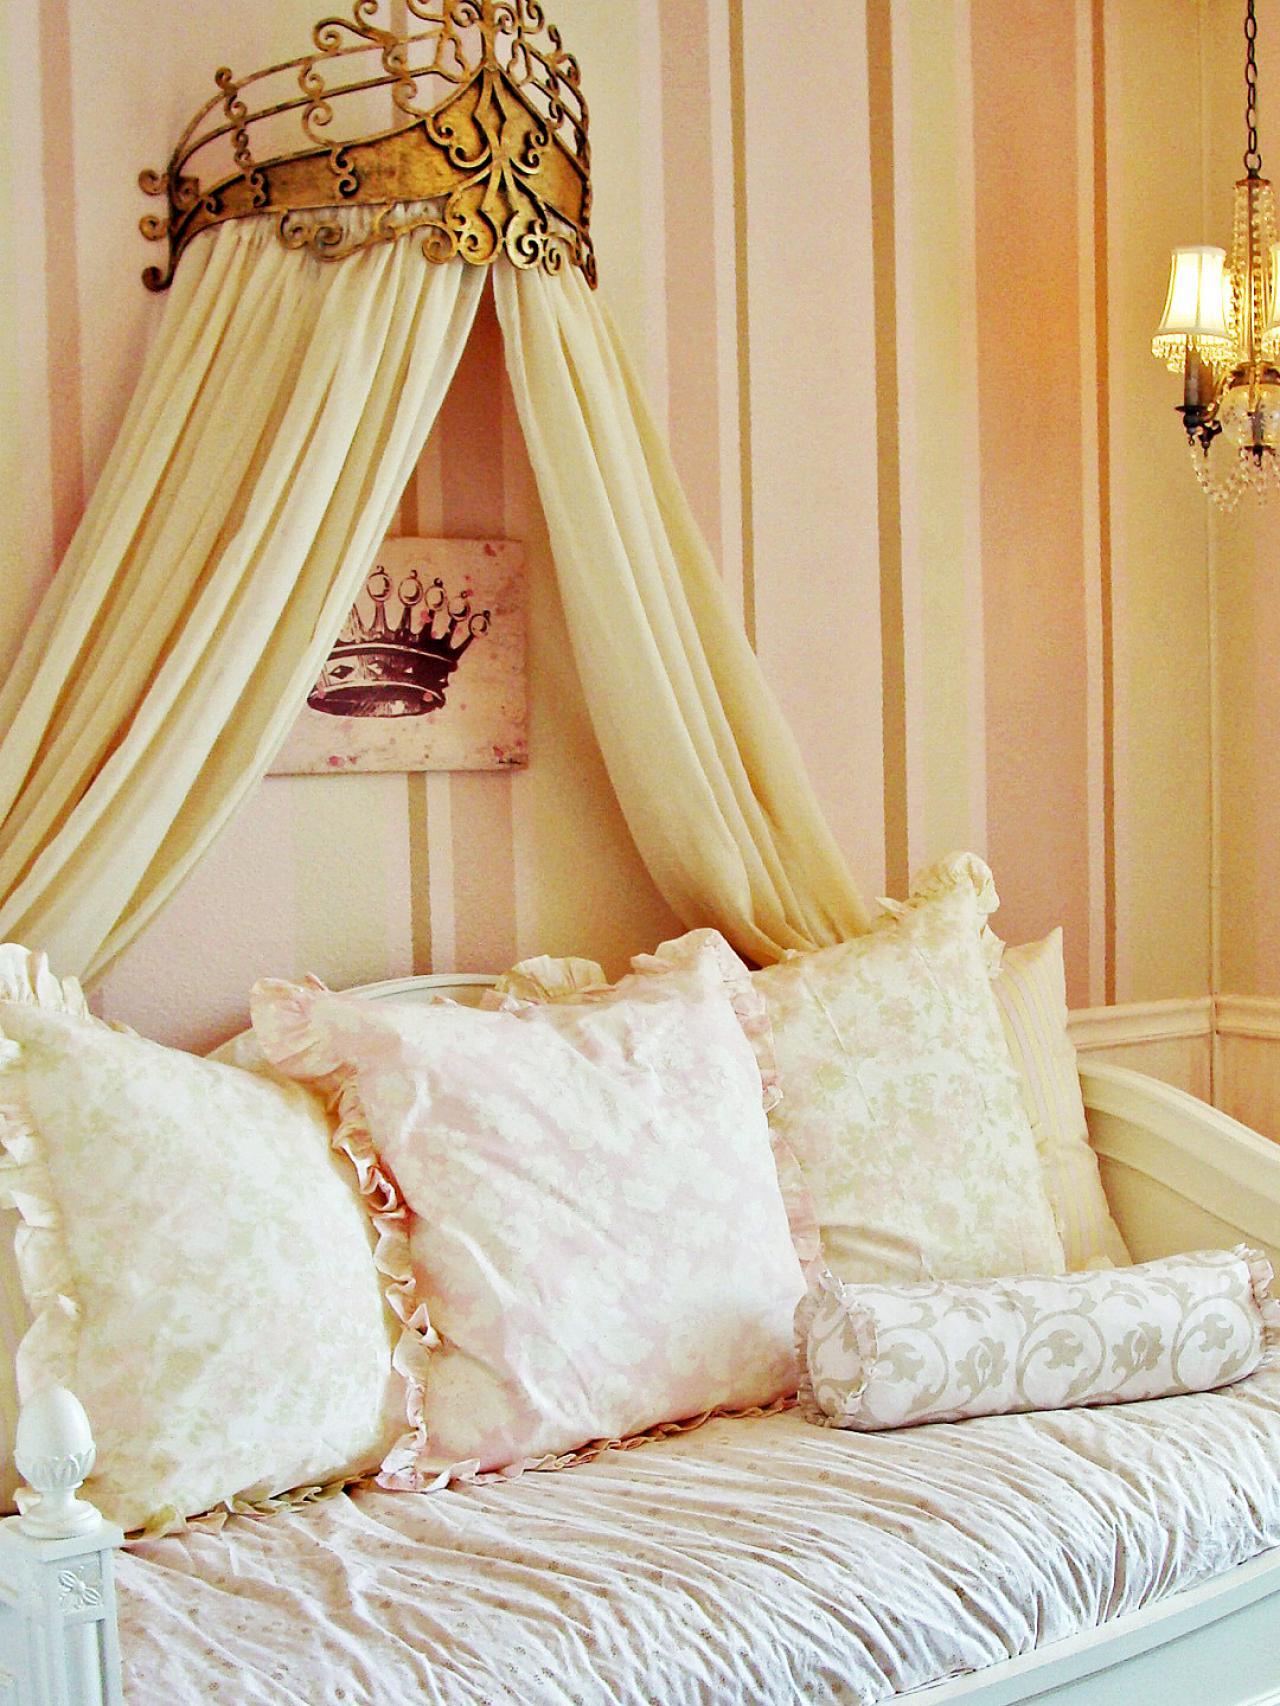 Princess Room Designs: Bedrooms & Bedroom Decorating